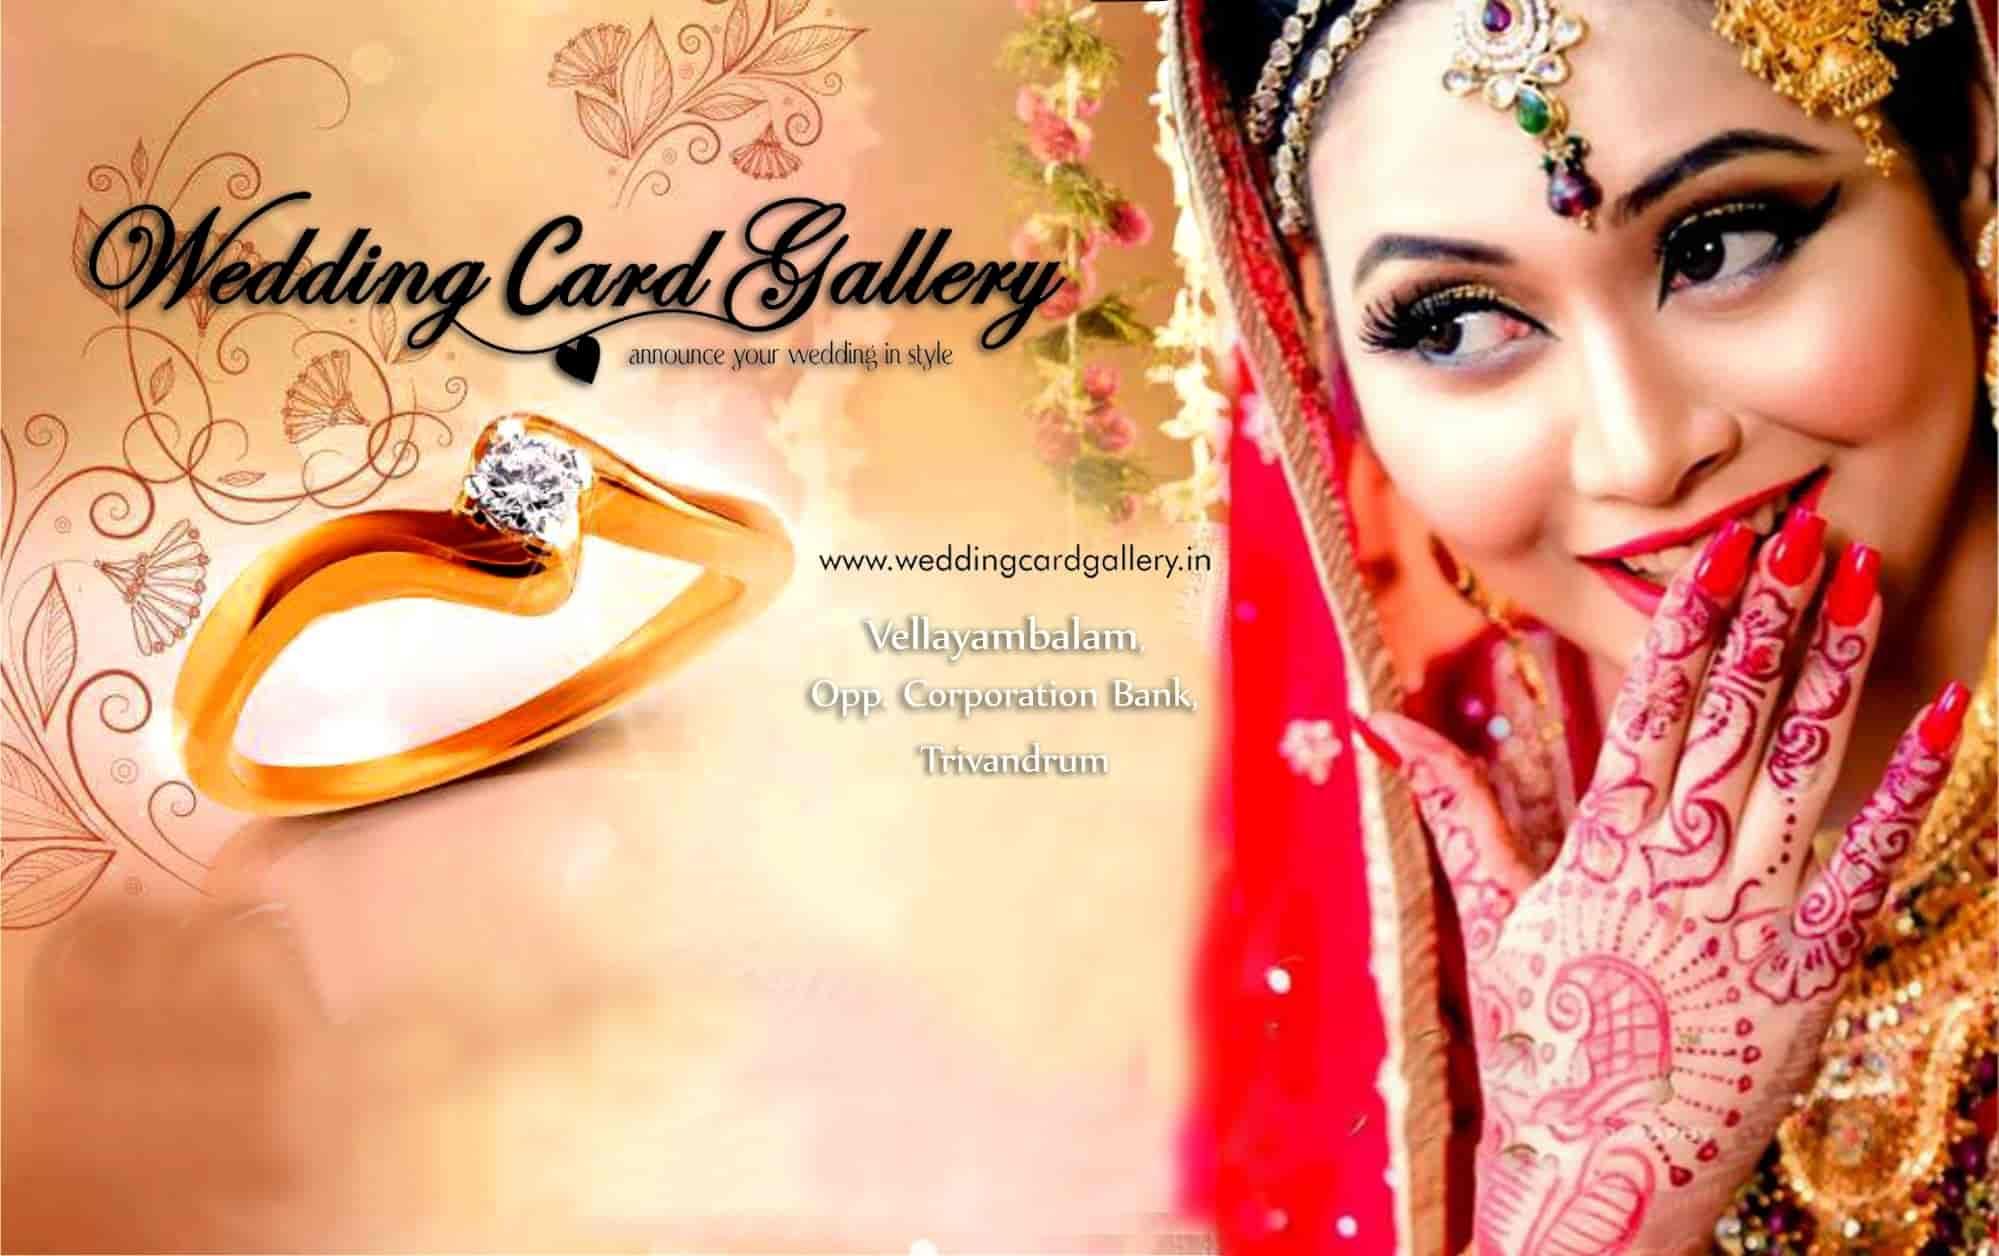 Wedding Card Gallery, Vellayambalam - Wedding Card Printers